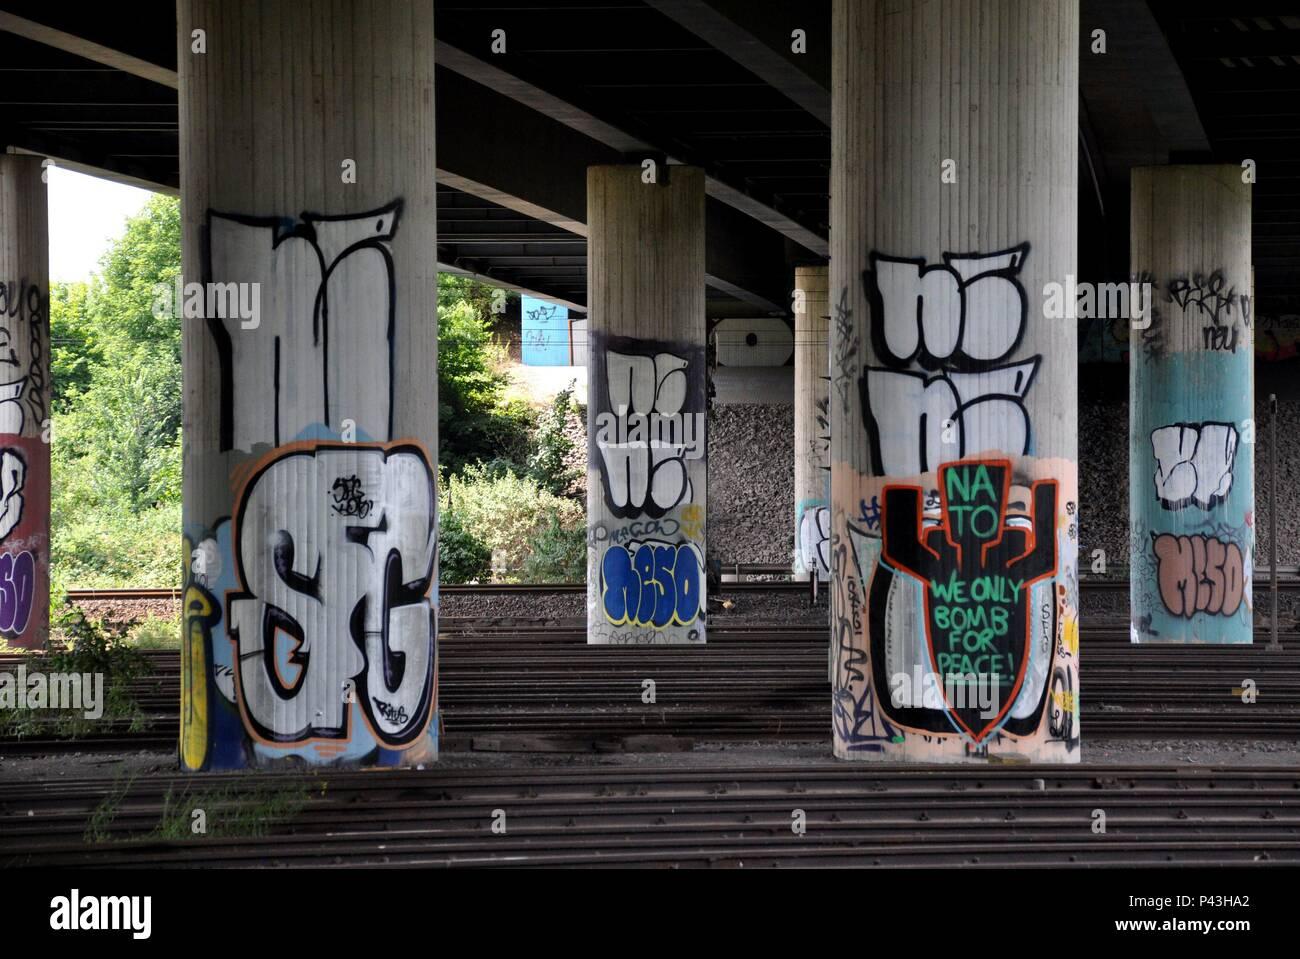 Graffiti 'Nato, we only bomb for peace!' on bridge pier on 05.07.2015 in Dortmund-Huckarde - Germany. | usage worldwide - Stock Image